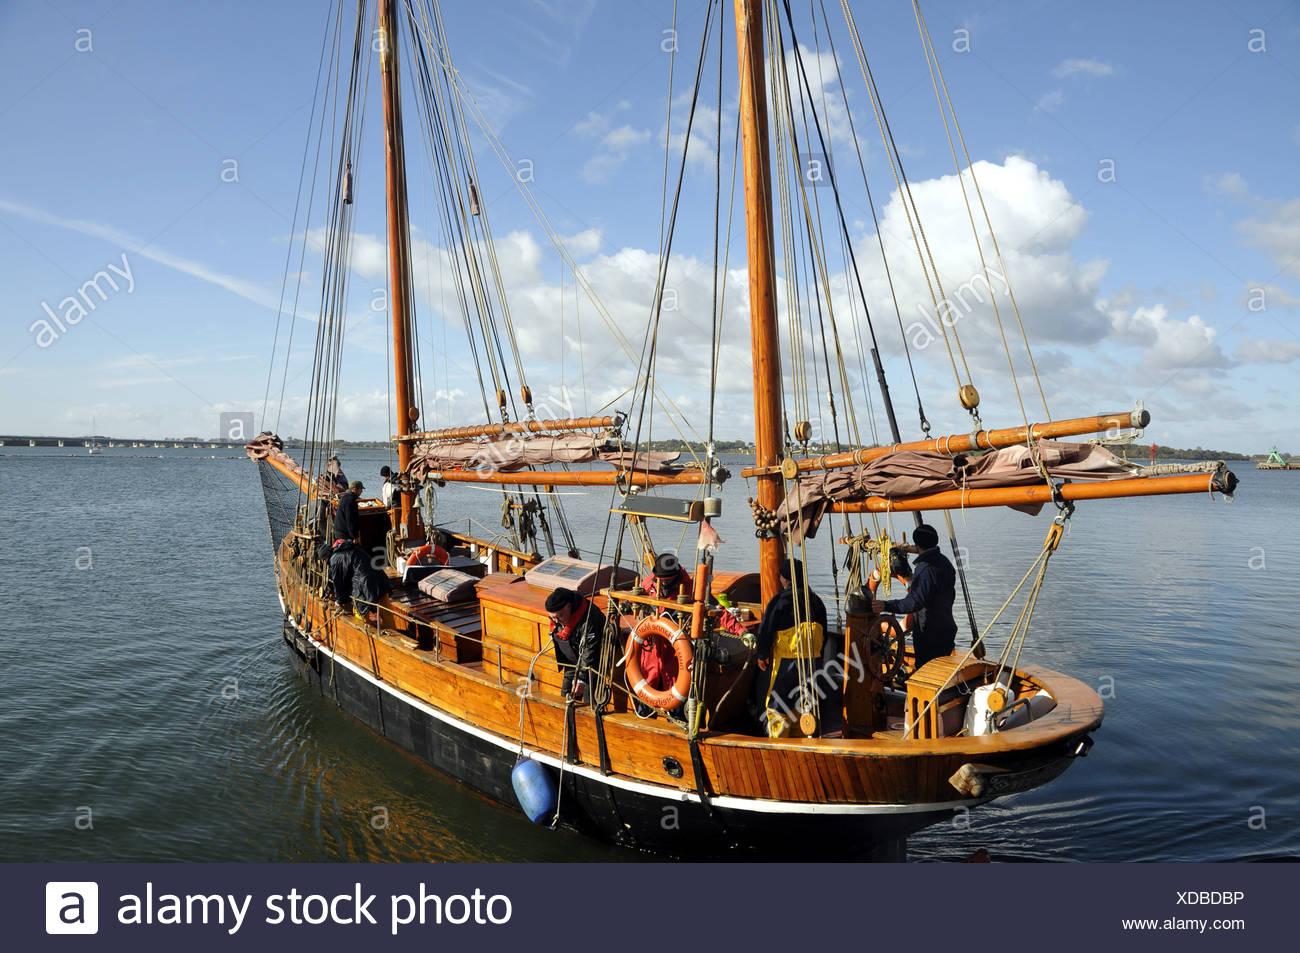 old sailing boat, Germany, Mecklenburg-Western Pomerania, Stralsund - Stock Image